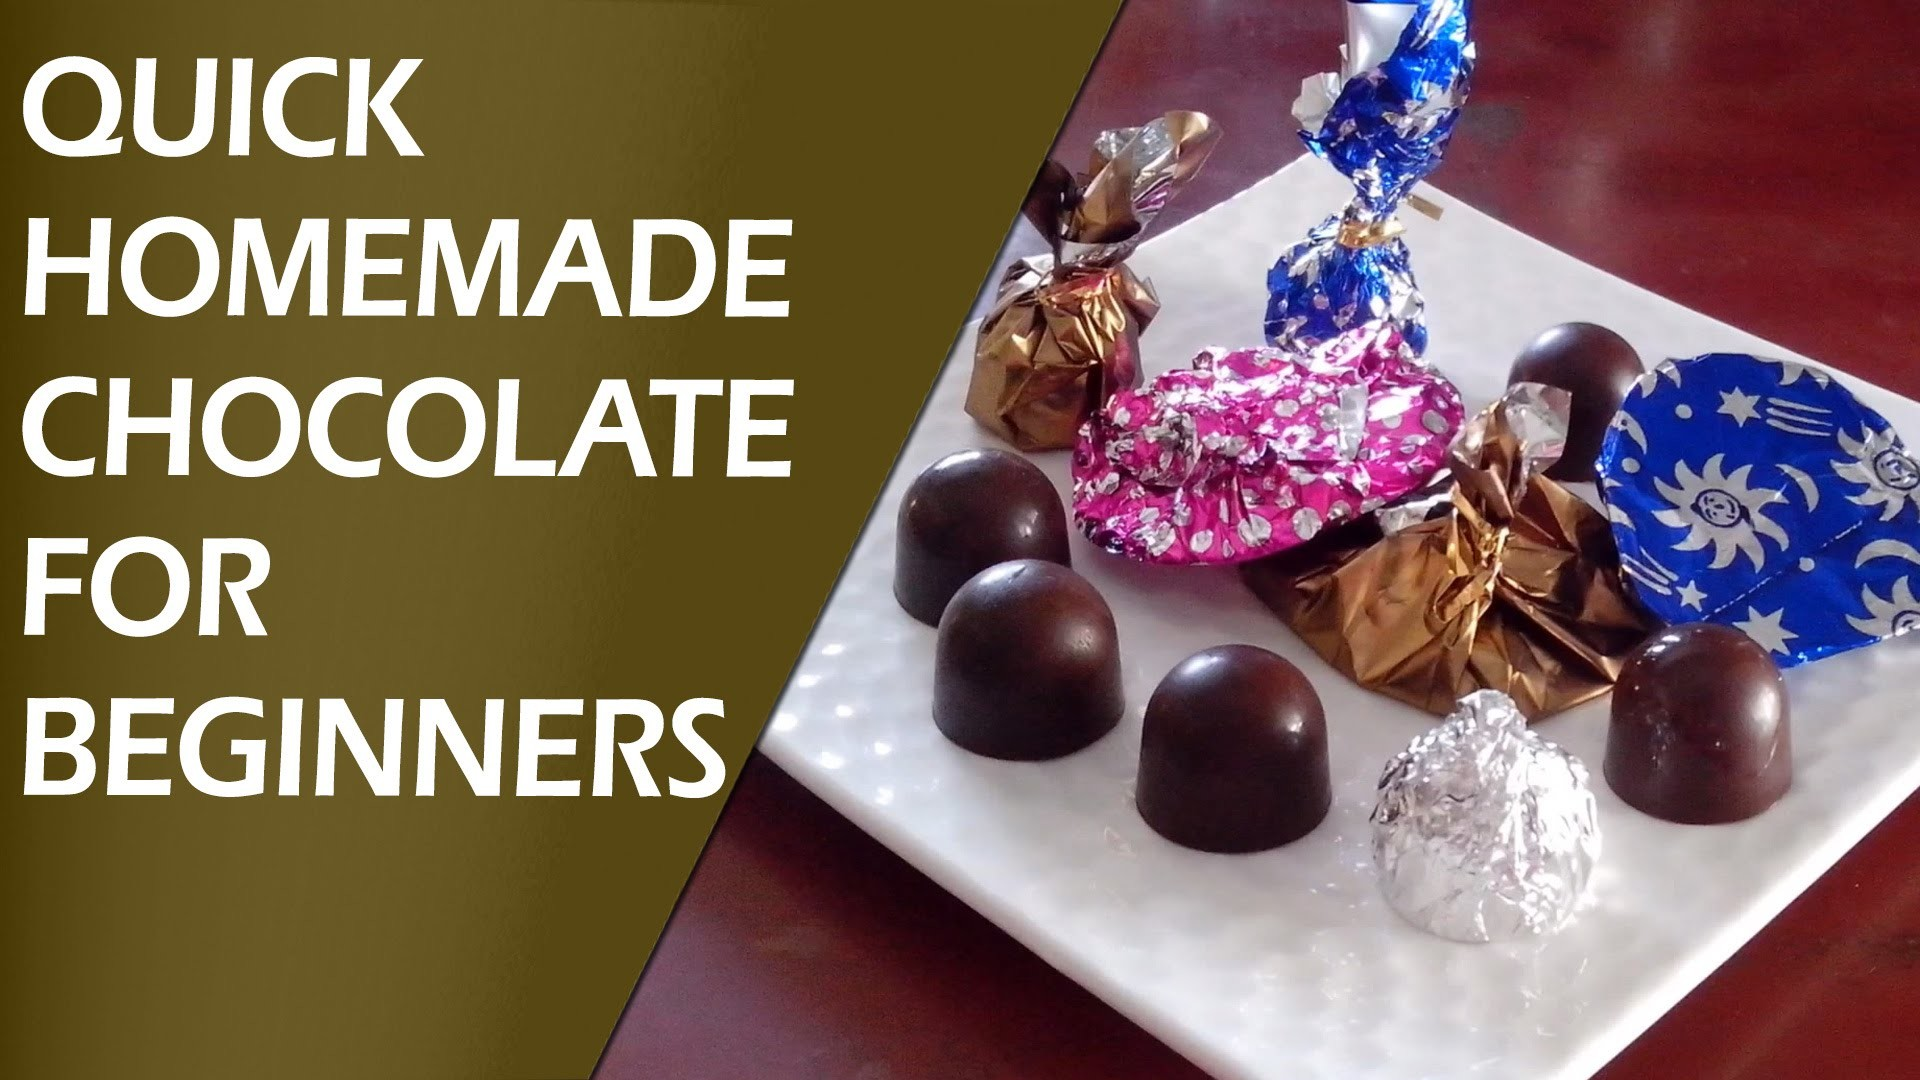 Quick Homemade Chocolate Recipe for Beginners by KALPANA TALPADE